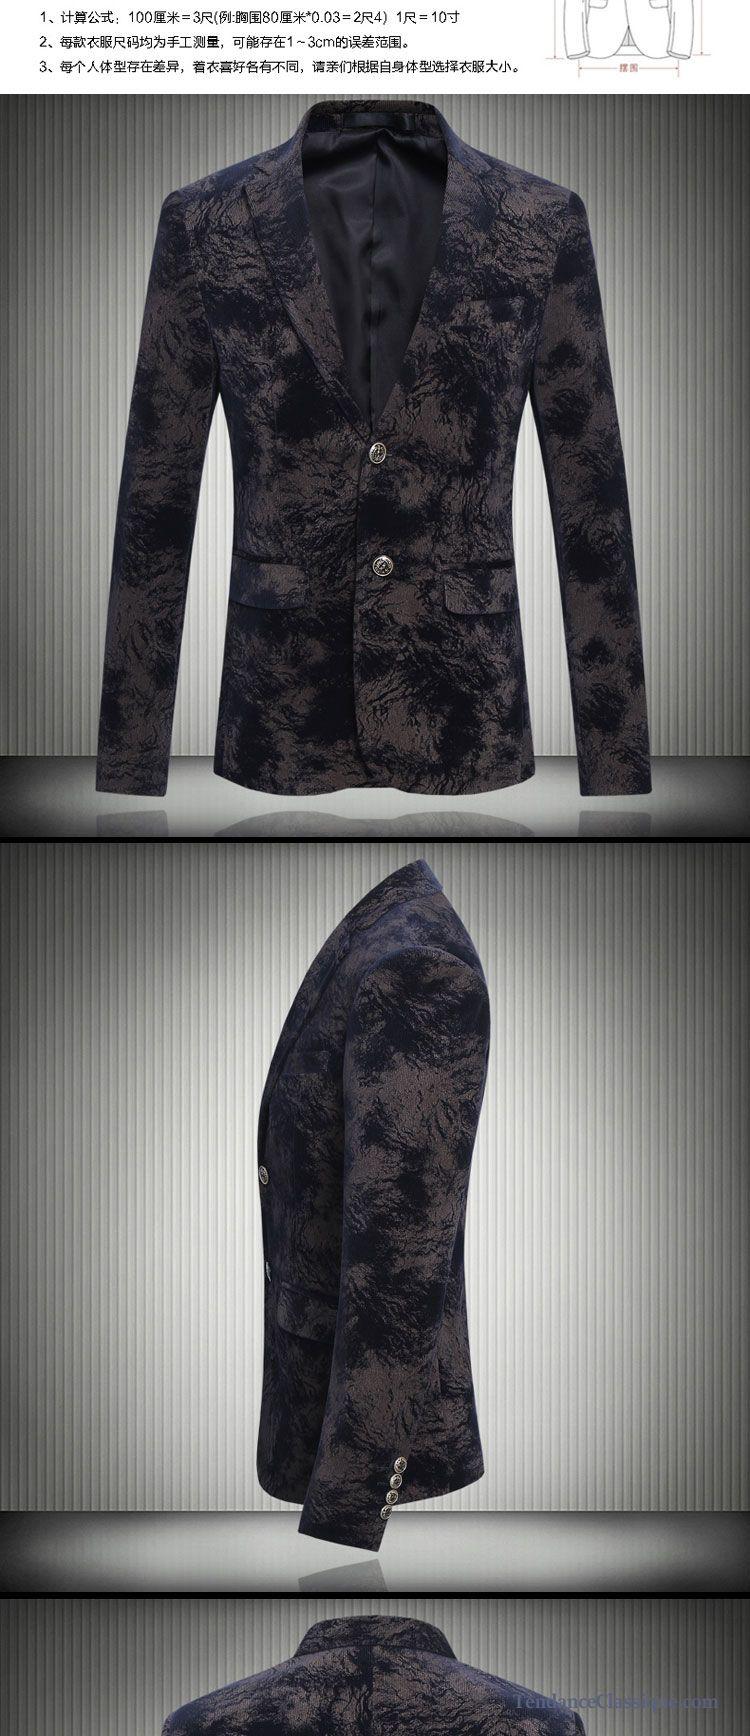 Veste De Blazer Homme Grande Taille, Blazer Mariage Original